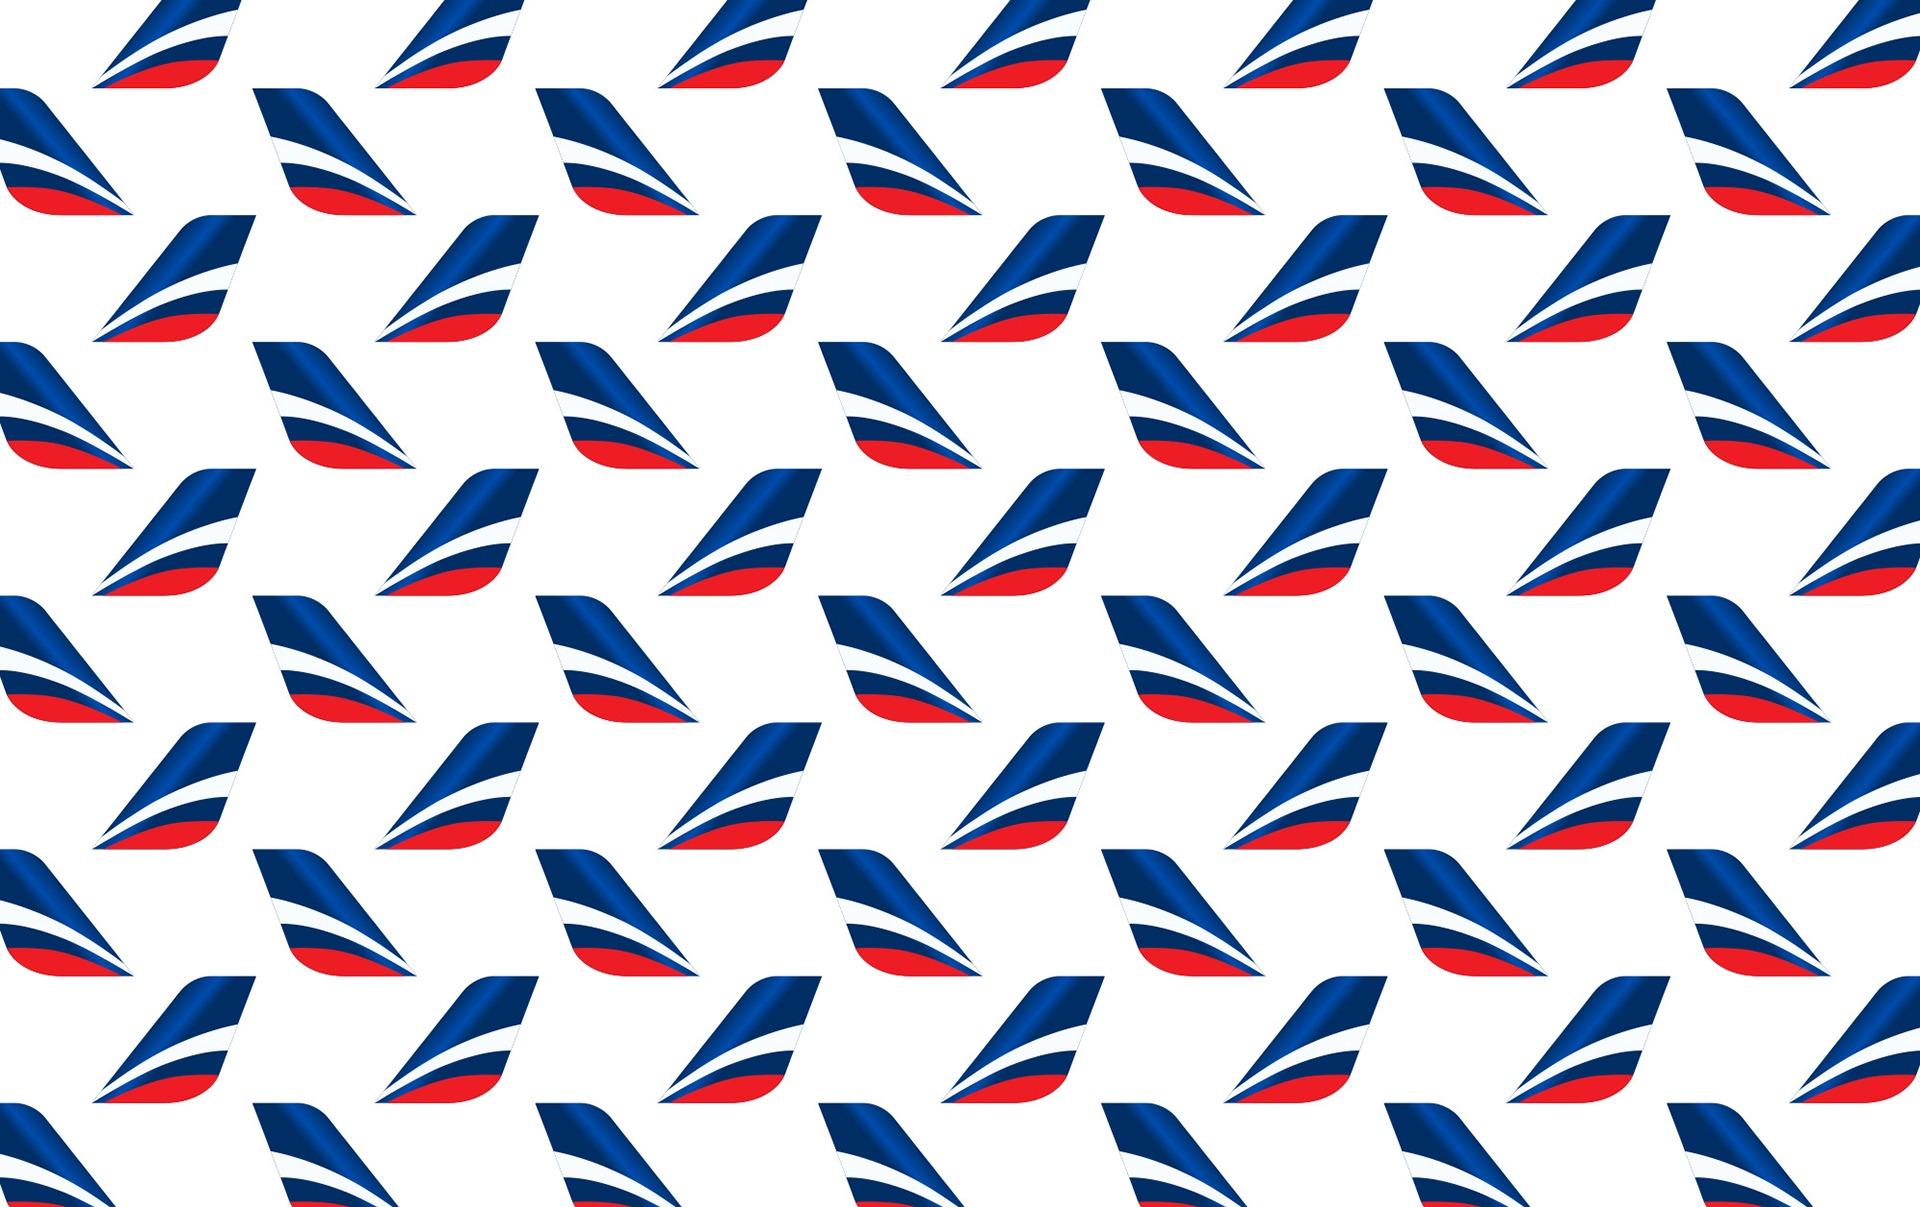 Фирменный паттерн авиакомпании, Asgard Branding, логотип Аэрофлот, Aeroflot, Asgard Branding